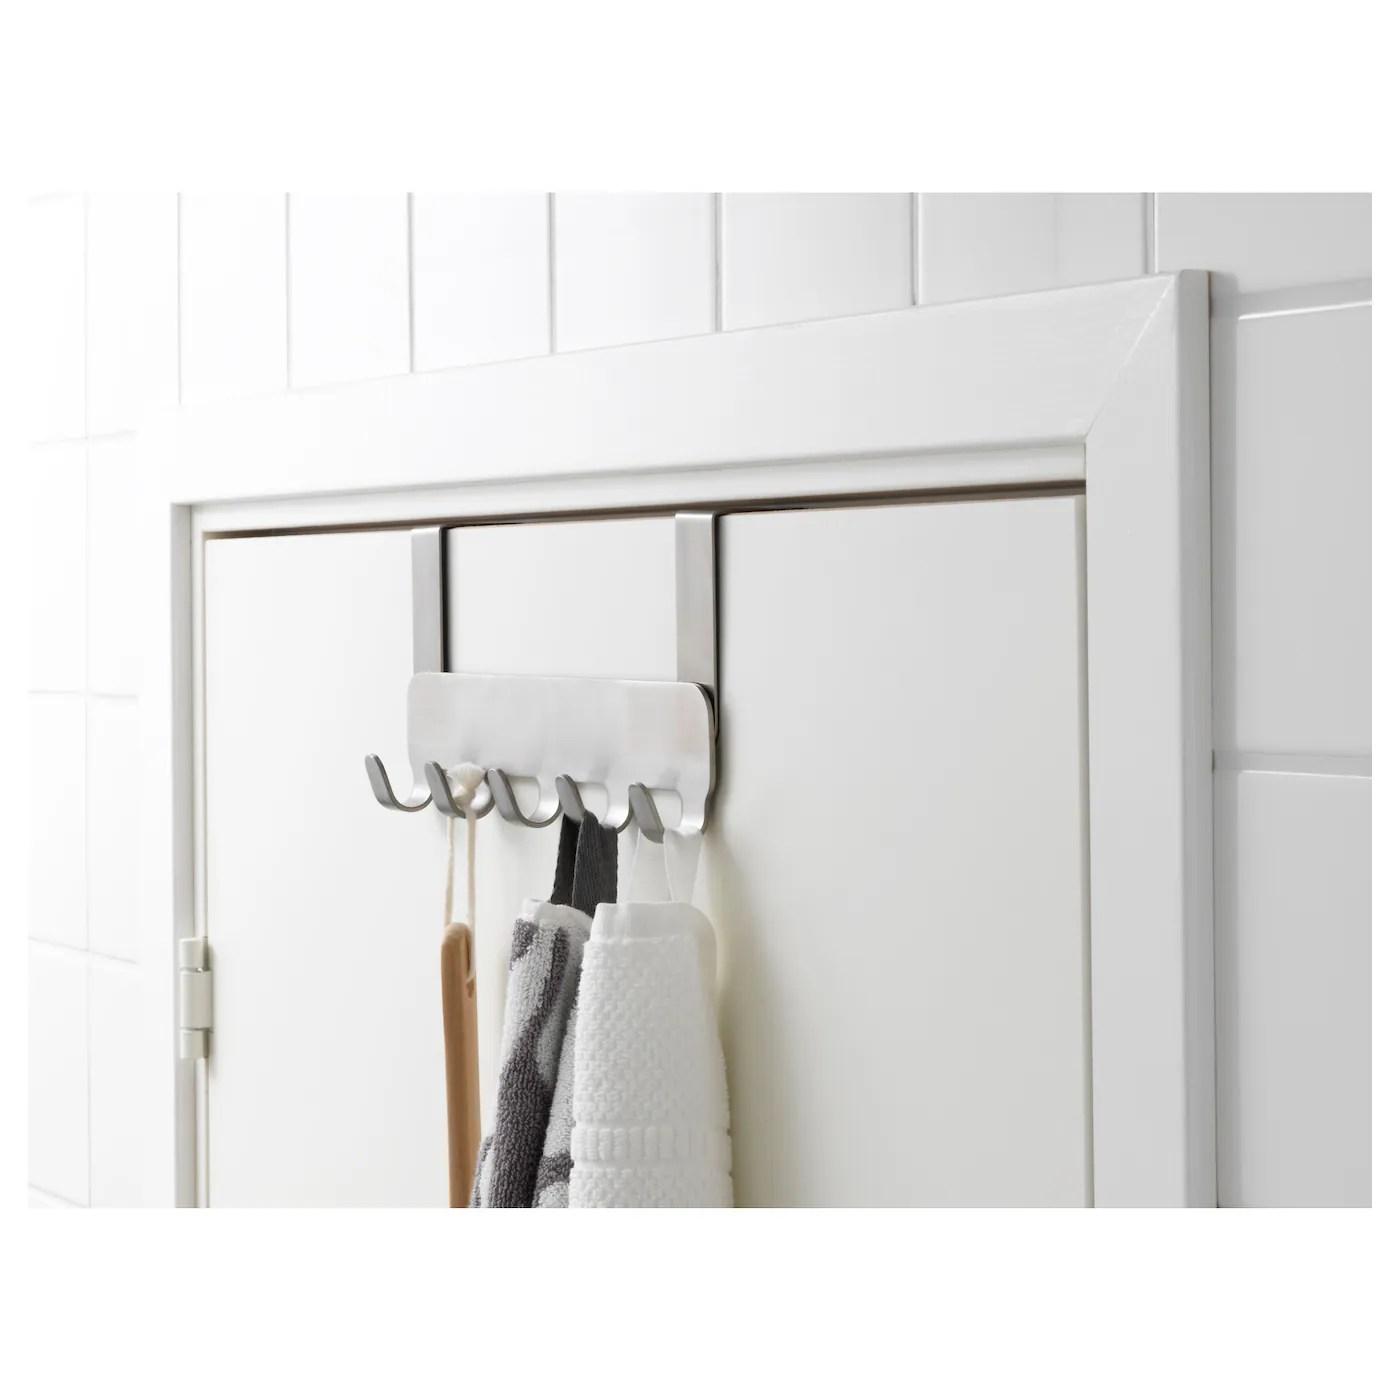 Brogrund Patere Pour Porte Acier Inoxydable Ikea